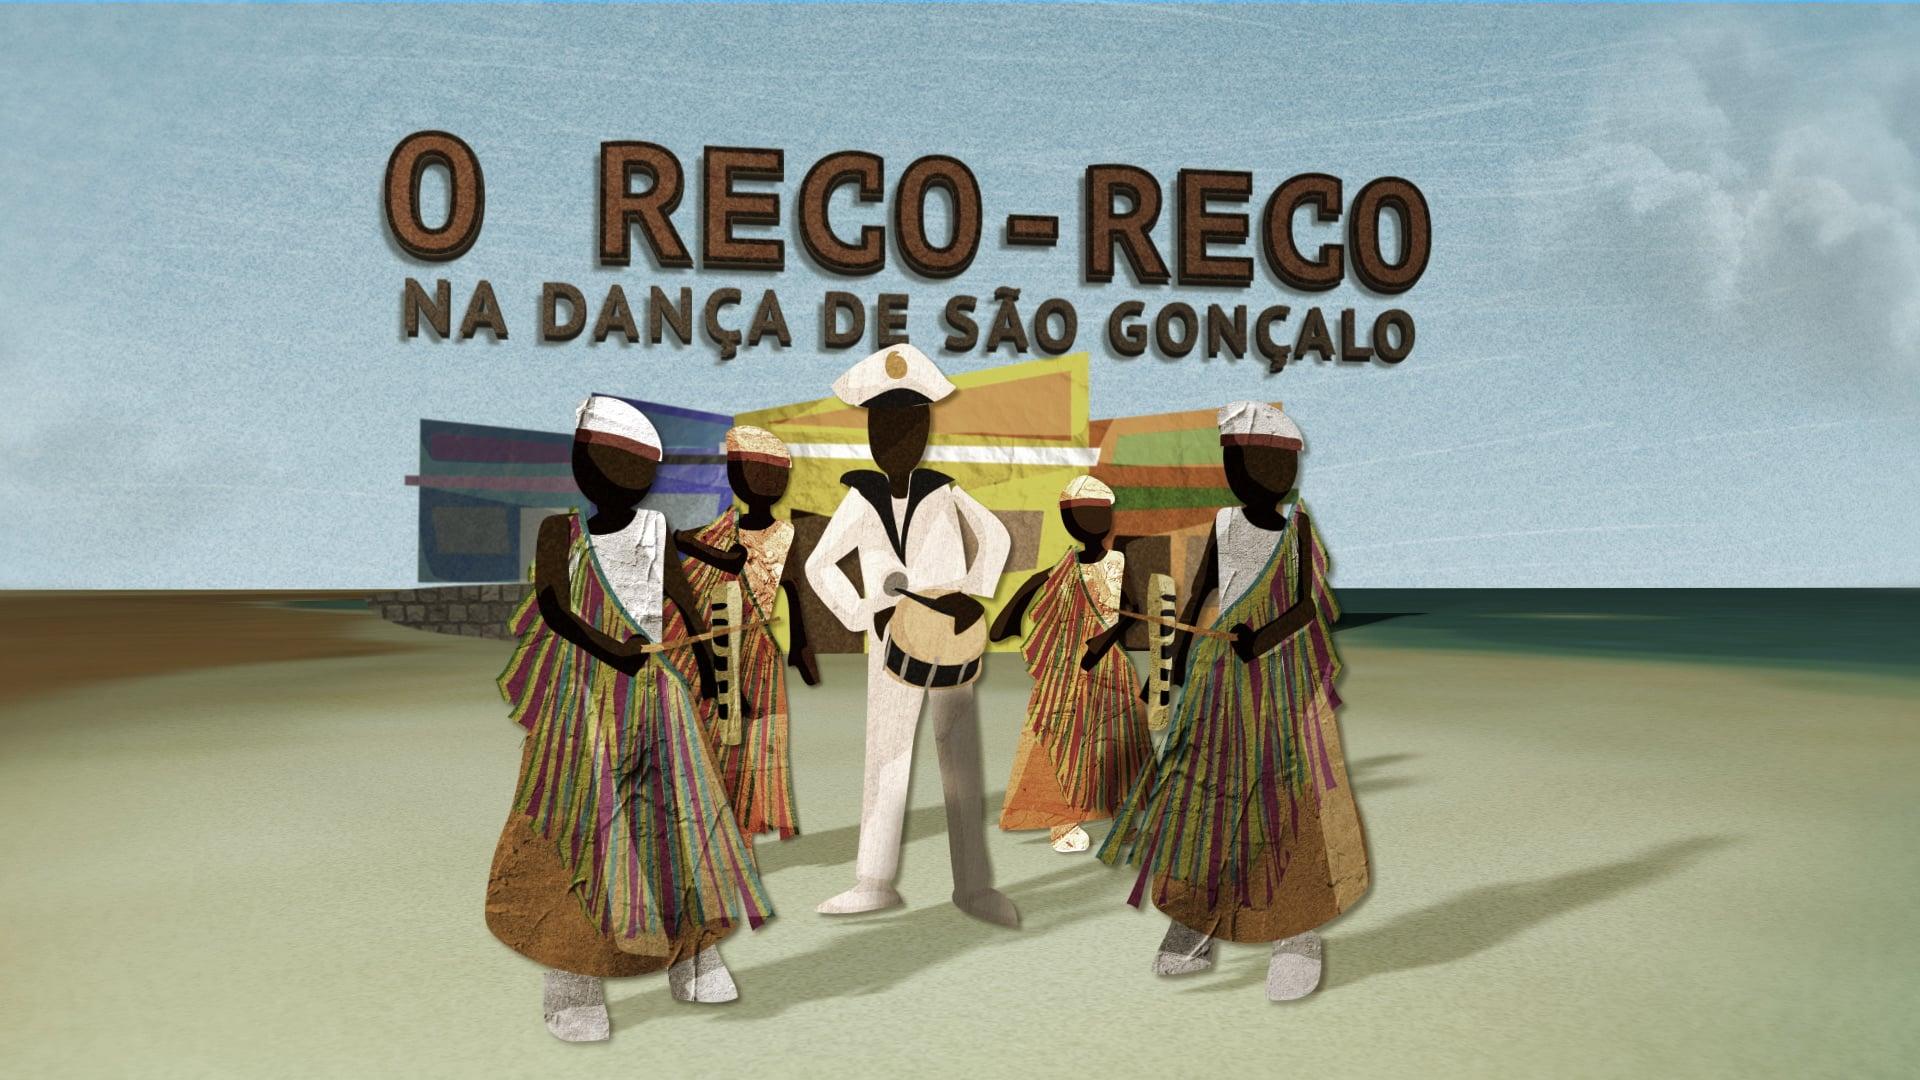 Taquaras 2 - Ep11 - Reco-Reco (Teaser)